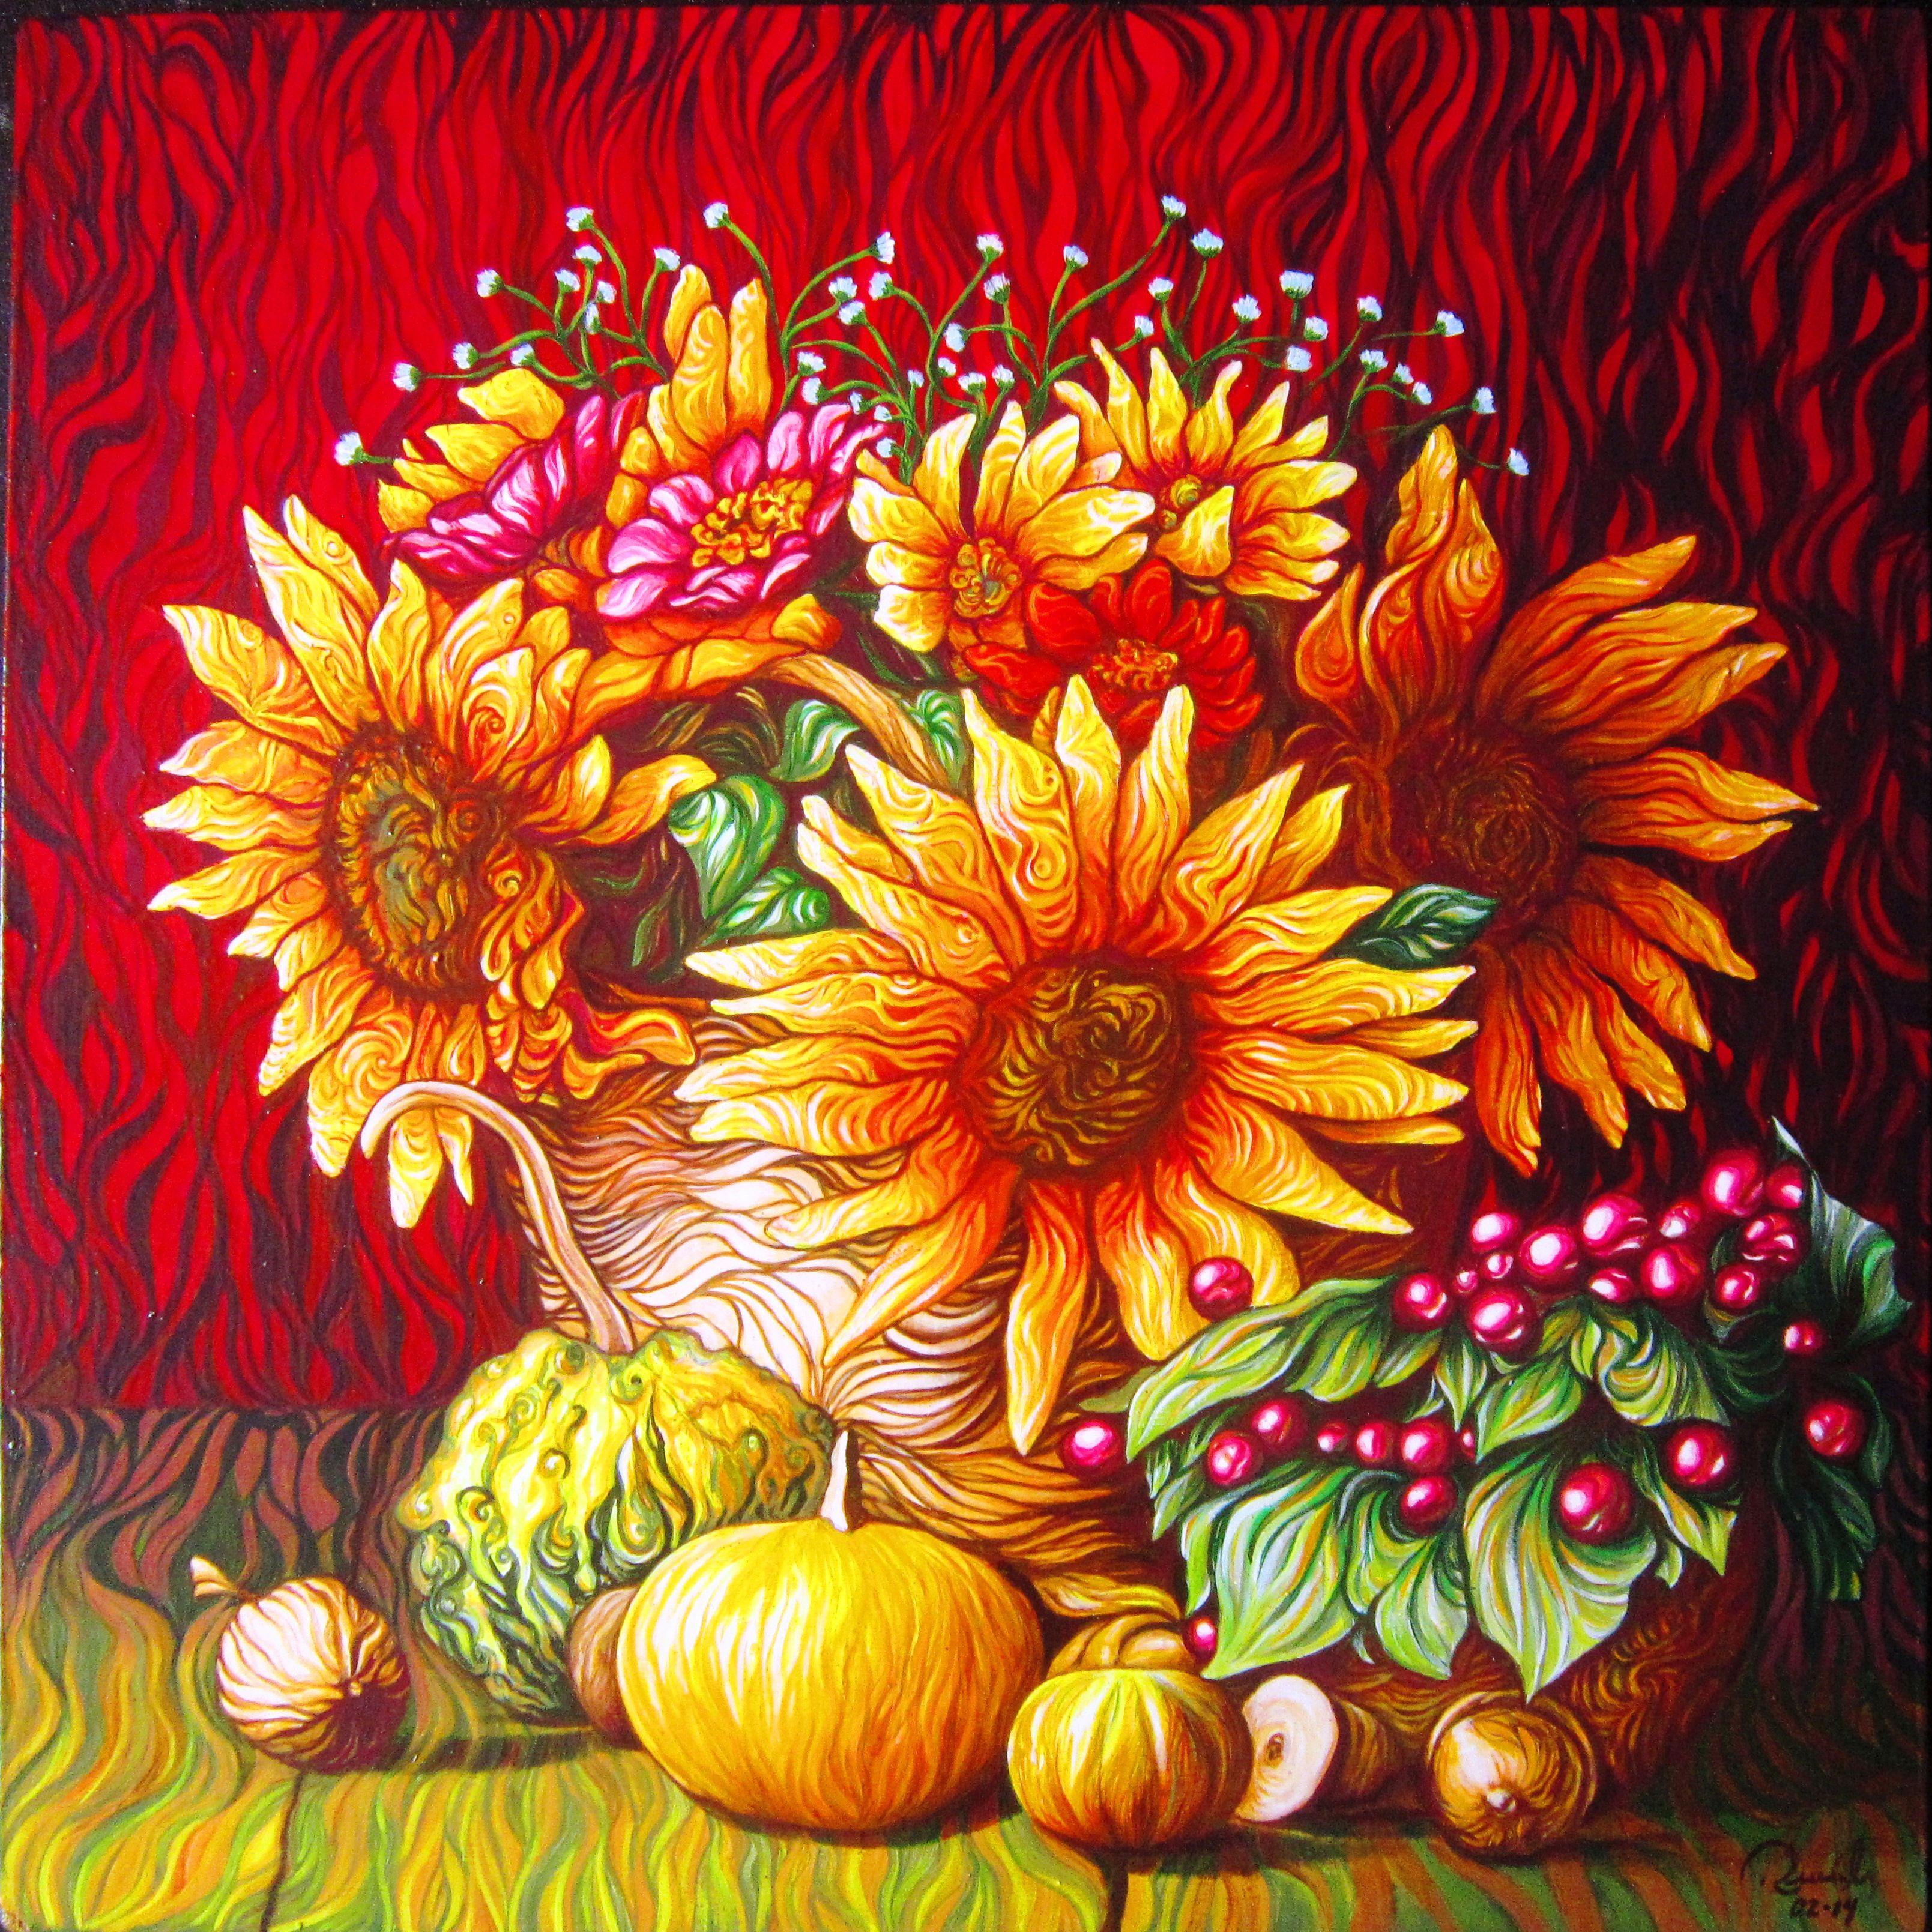 Cuadro Pintado Con Acrilico Sobres Madera De 50 X 50 Cm Pintado Por Pedro Rueda Gargurevich Mosaic Flowers Art Painting